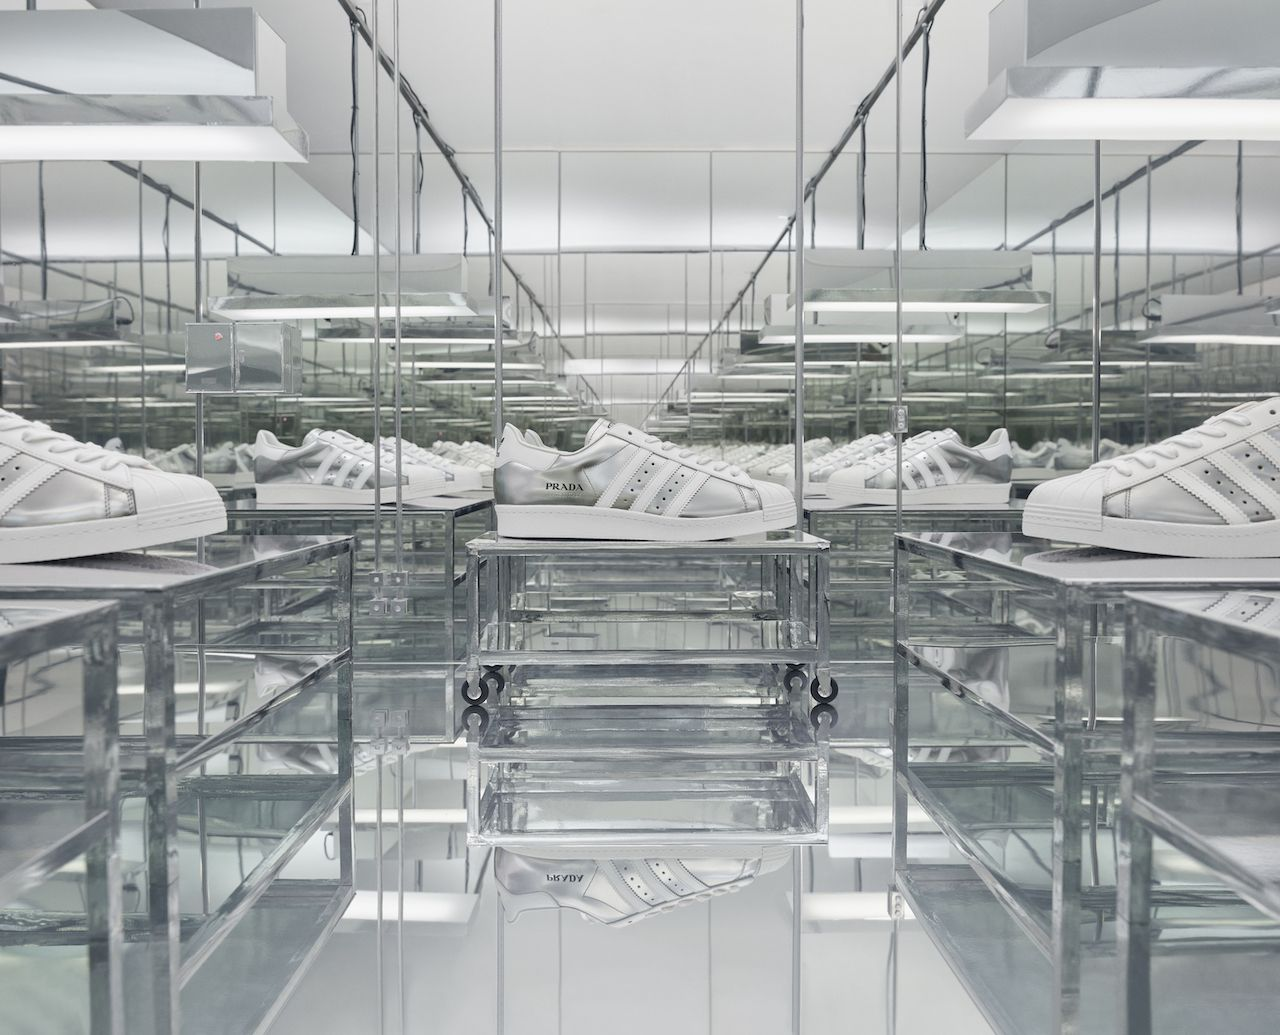 The Second Prada X Adidas Collaboration Drops Next Week